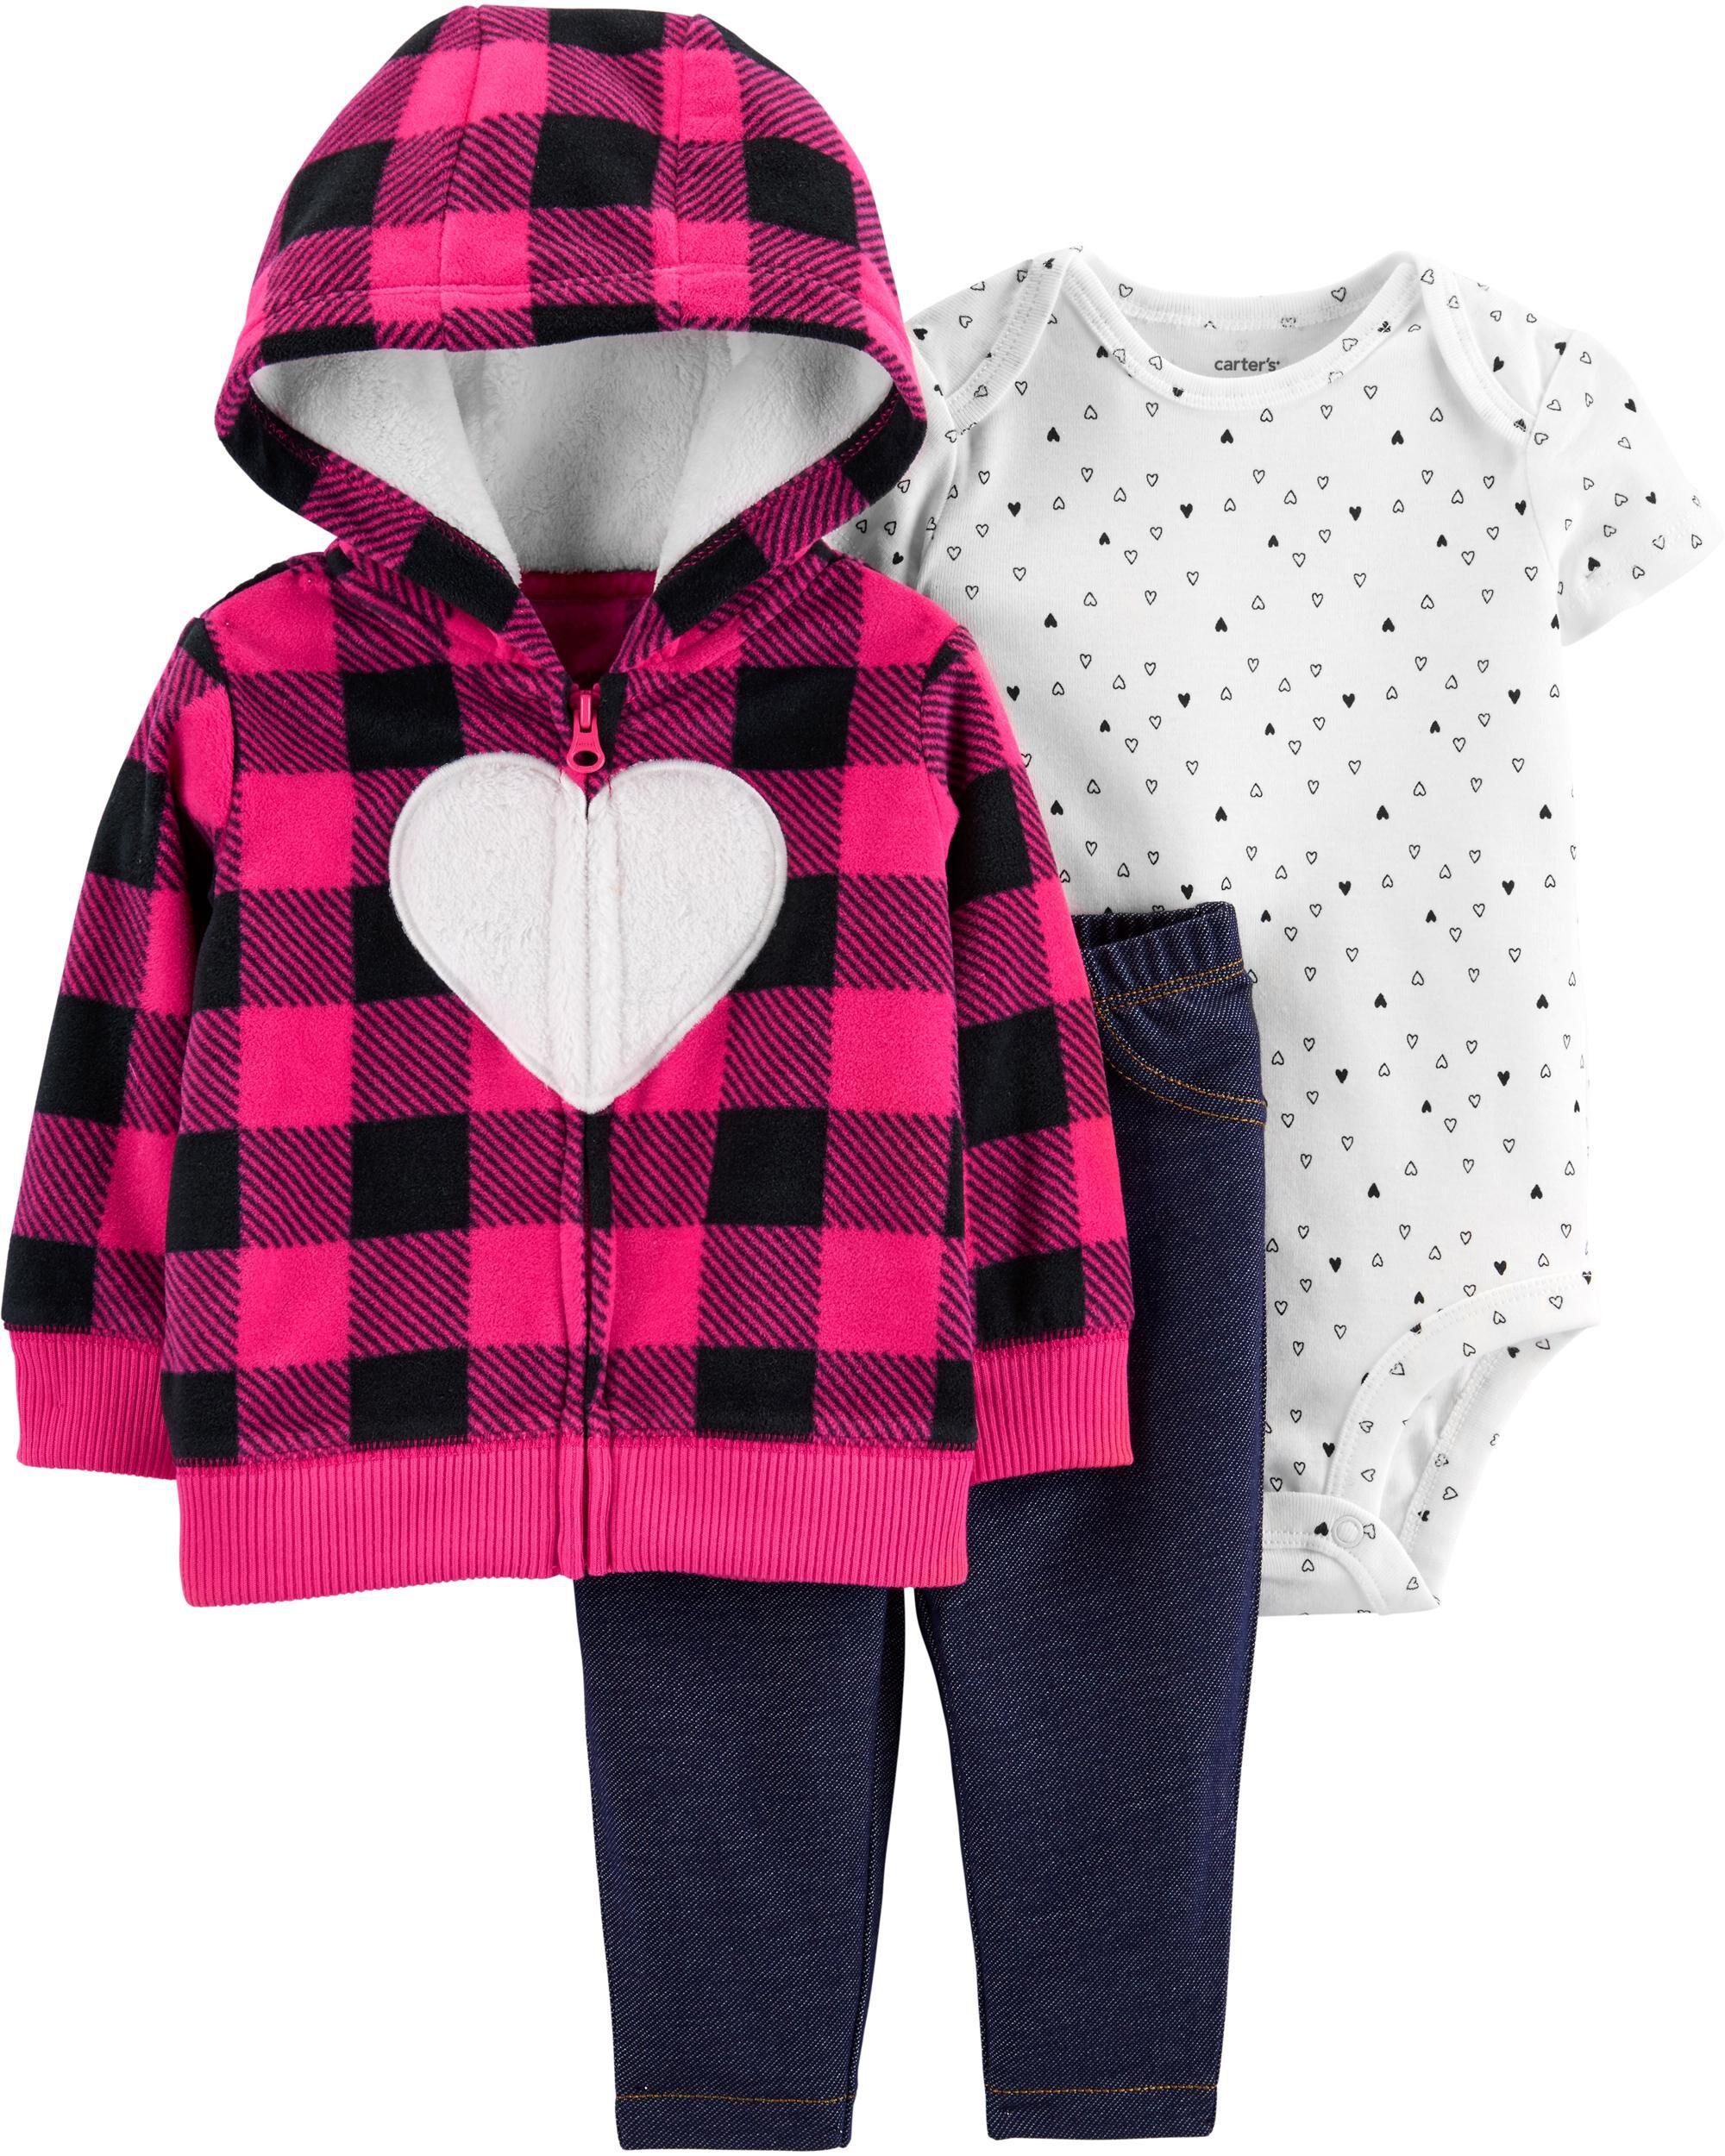 *CLEARANCE* 3-Piece Heart Little Jacket Set